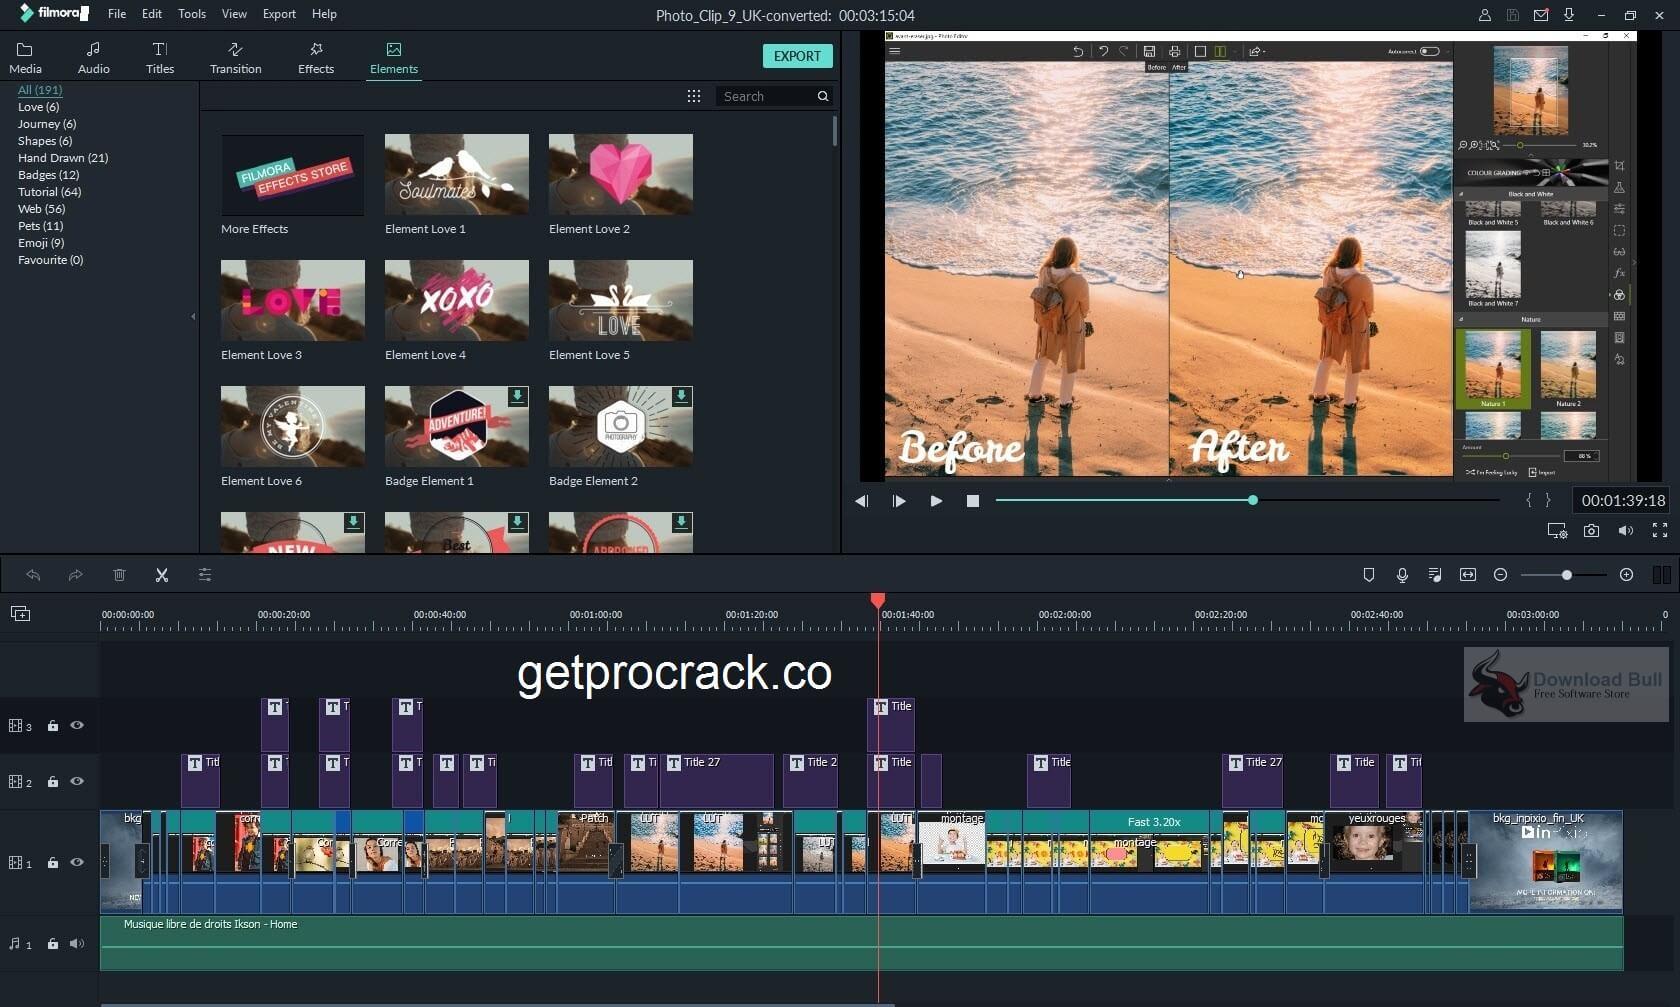 Wondershare Filmora 10.4.2.2 Crack & Serial Key [Latest] Free Download